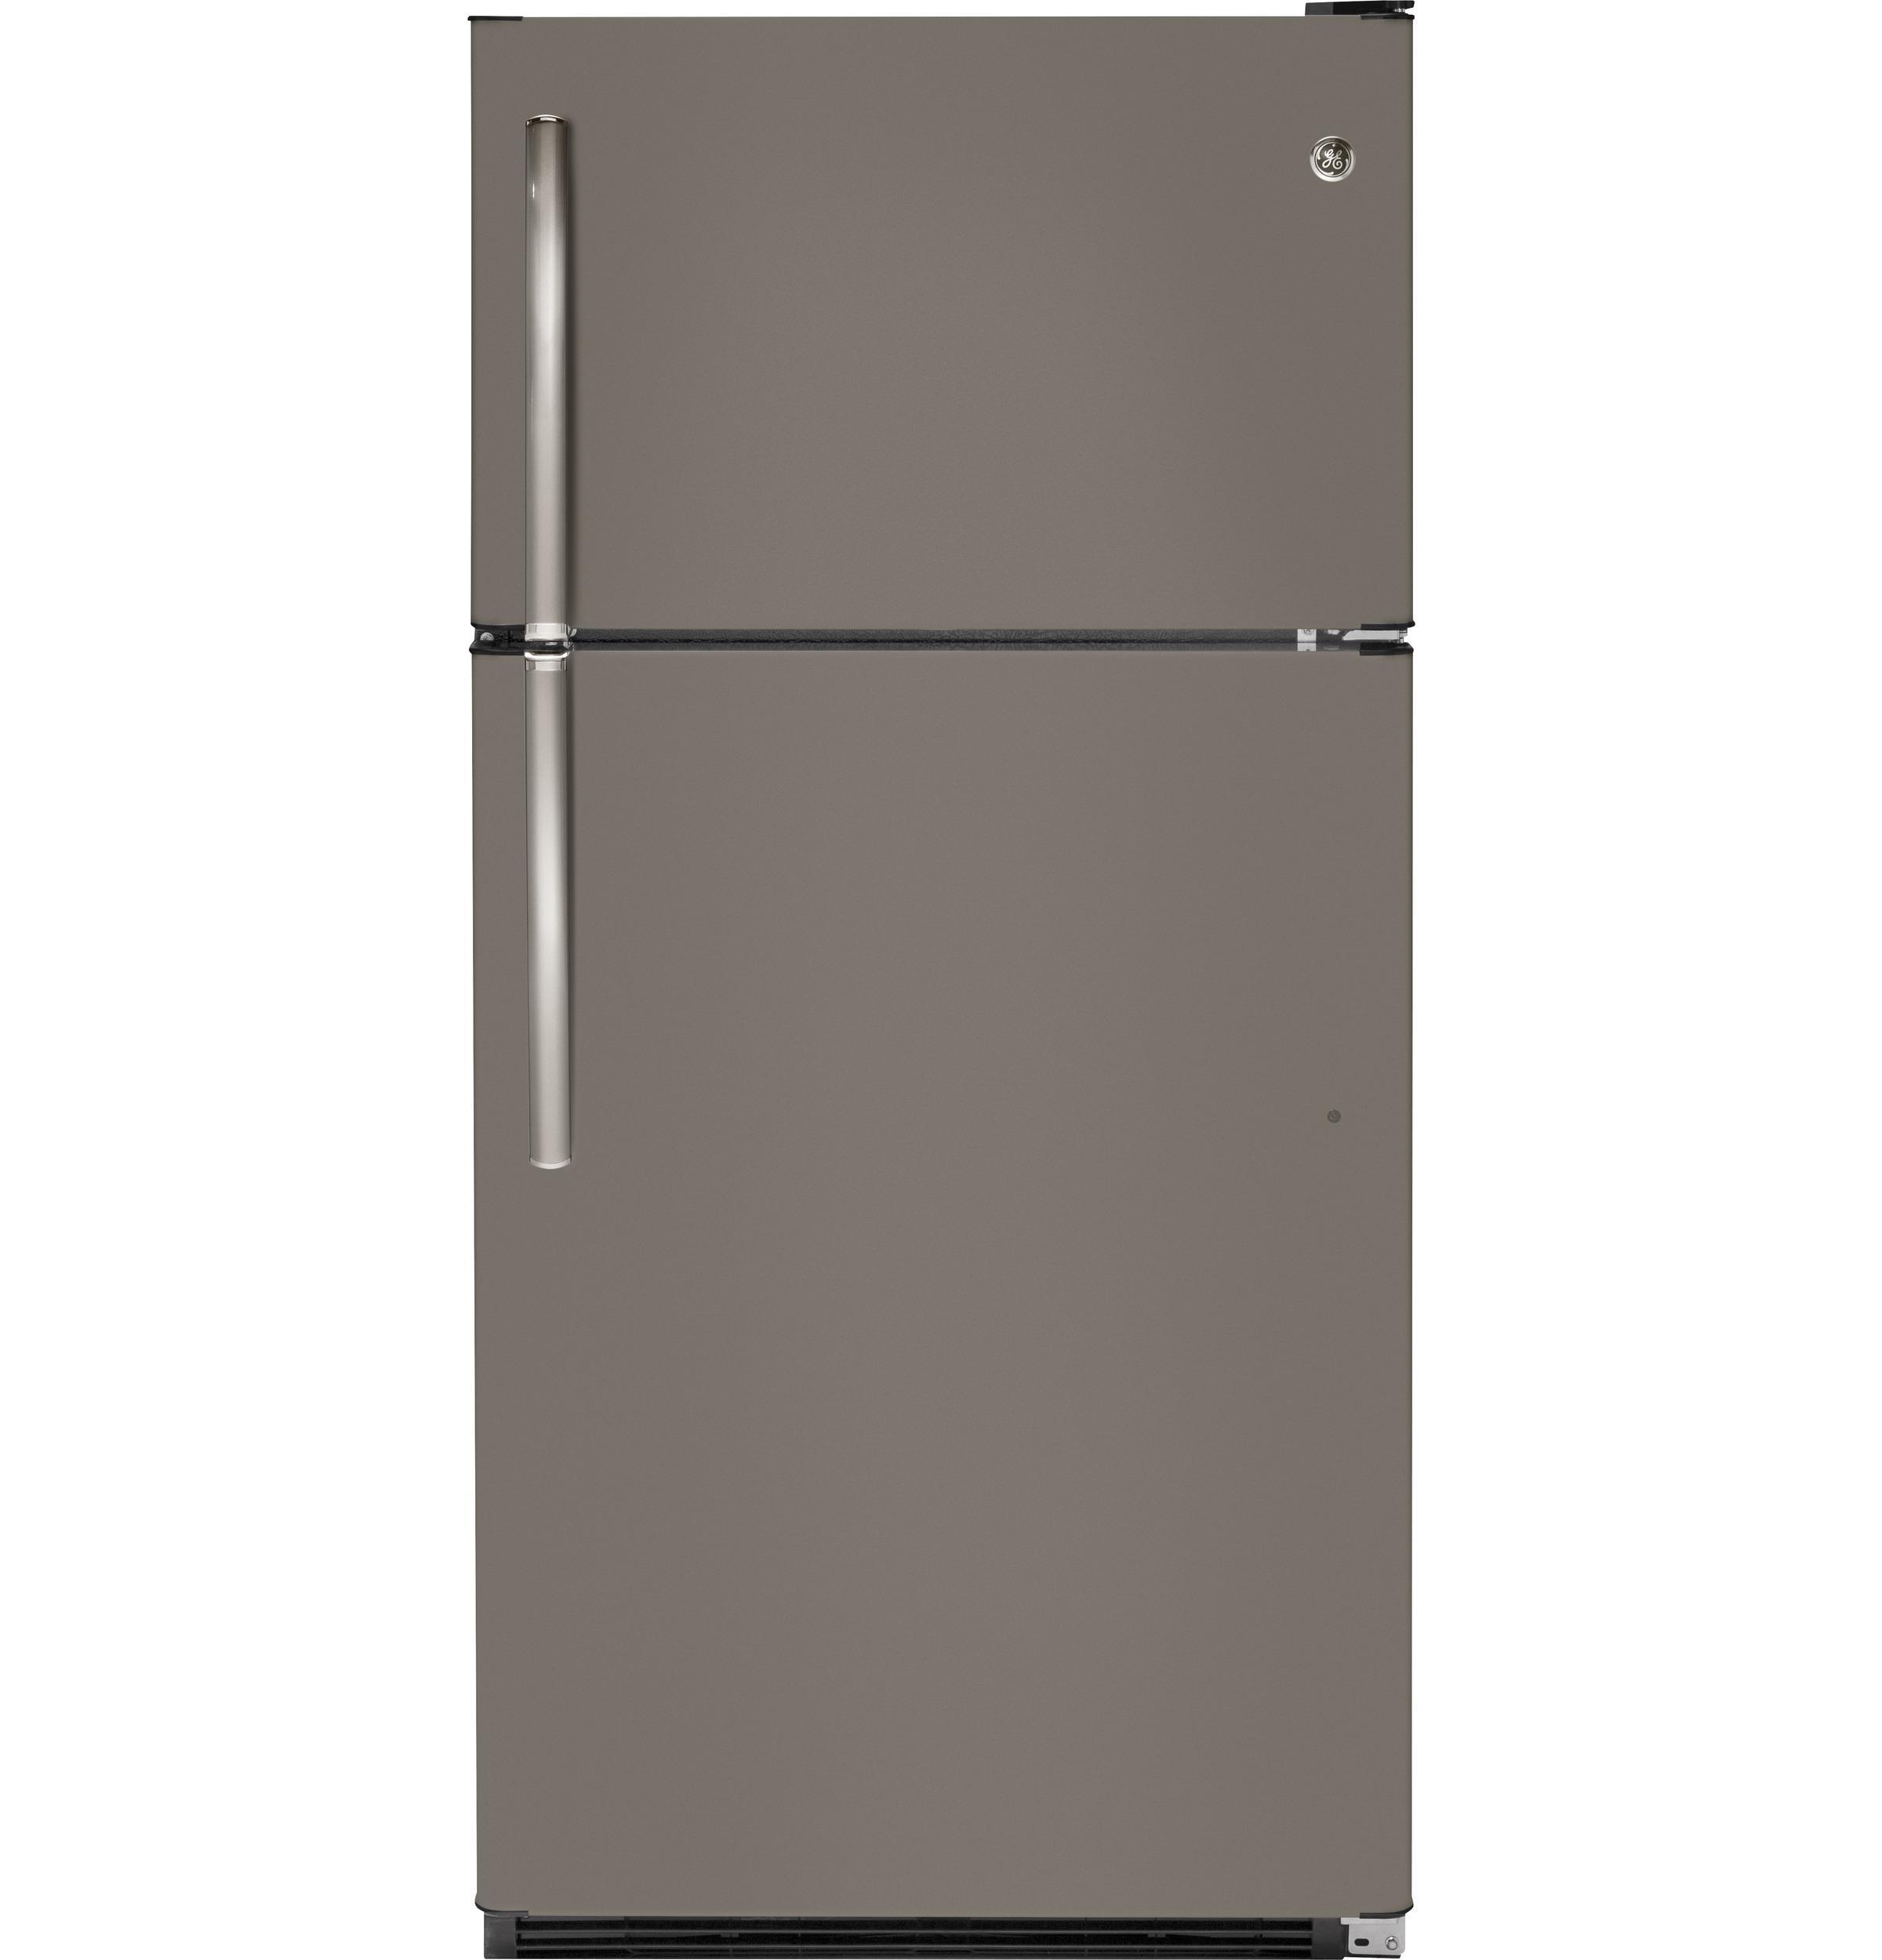 GE Appliances - GTS21FMKES